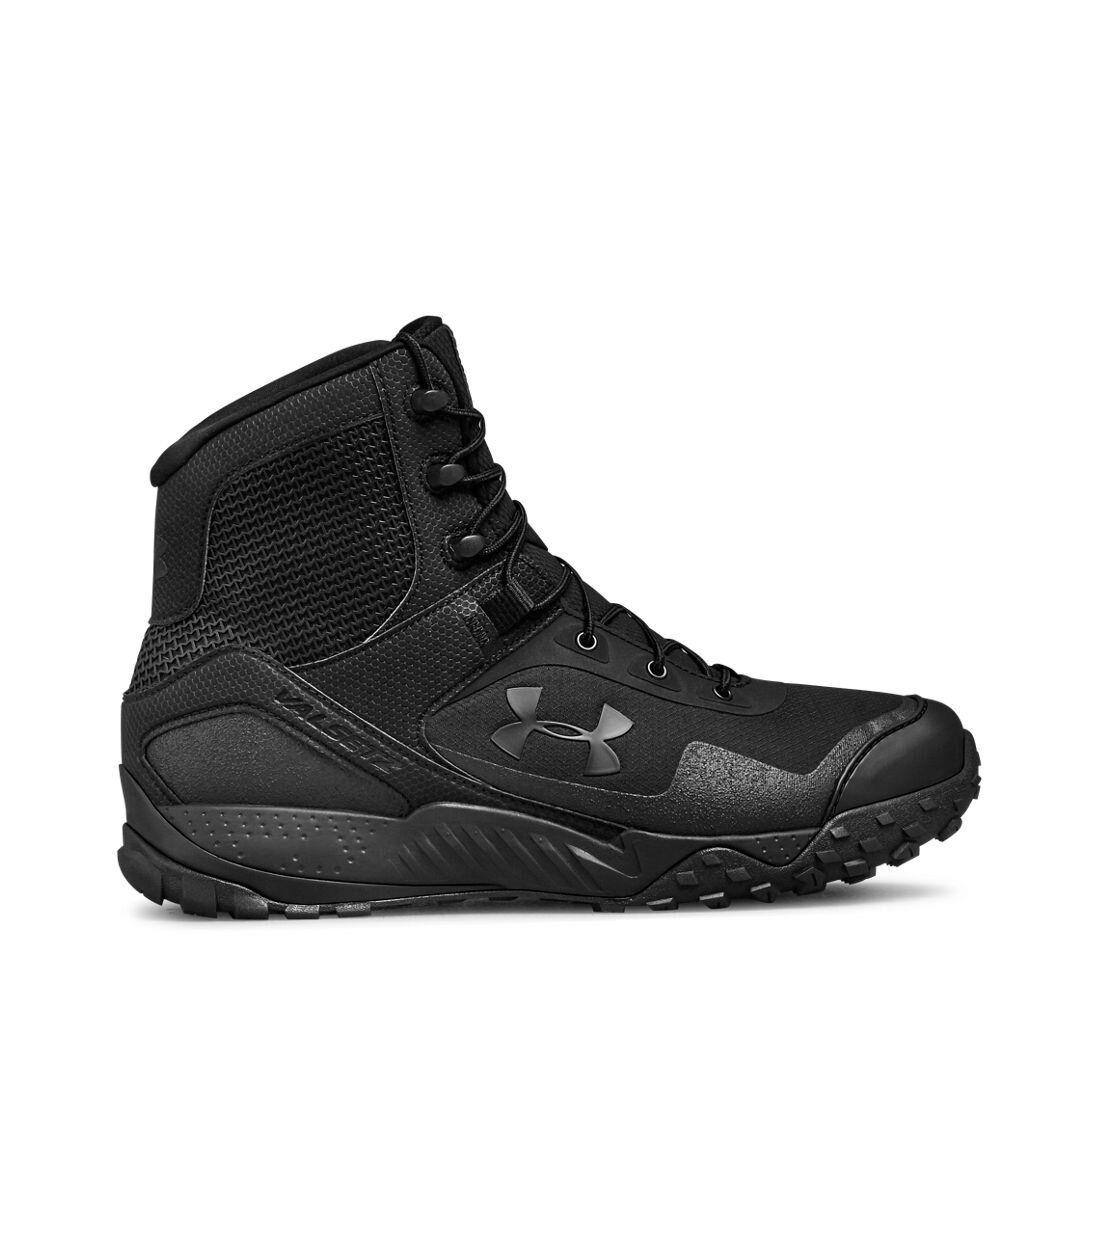 Under Armour Men's Valsetz RTS  Side Zip Tactical Boots Blac